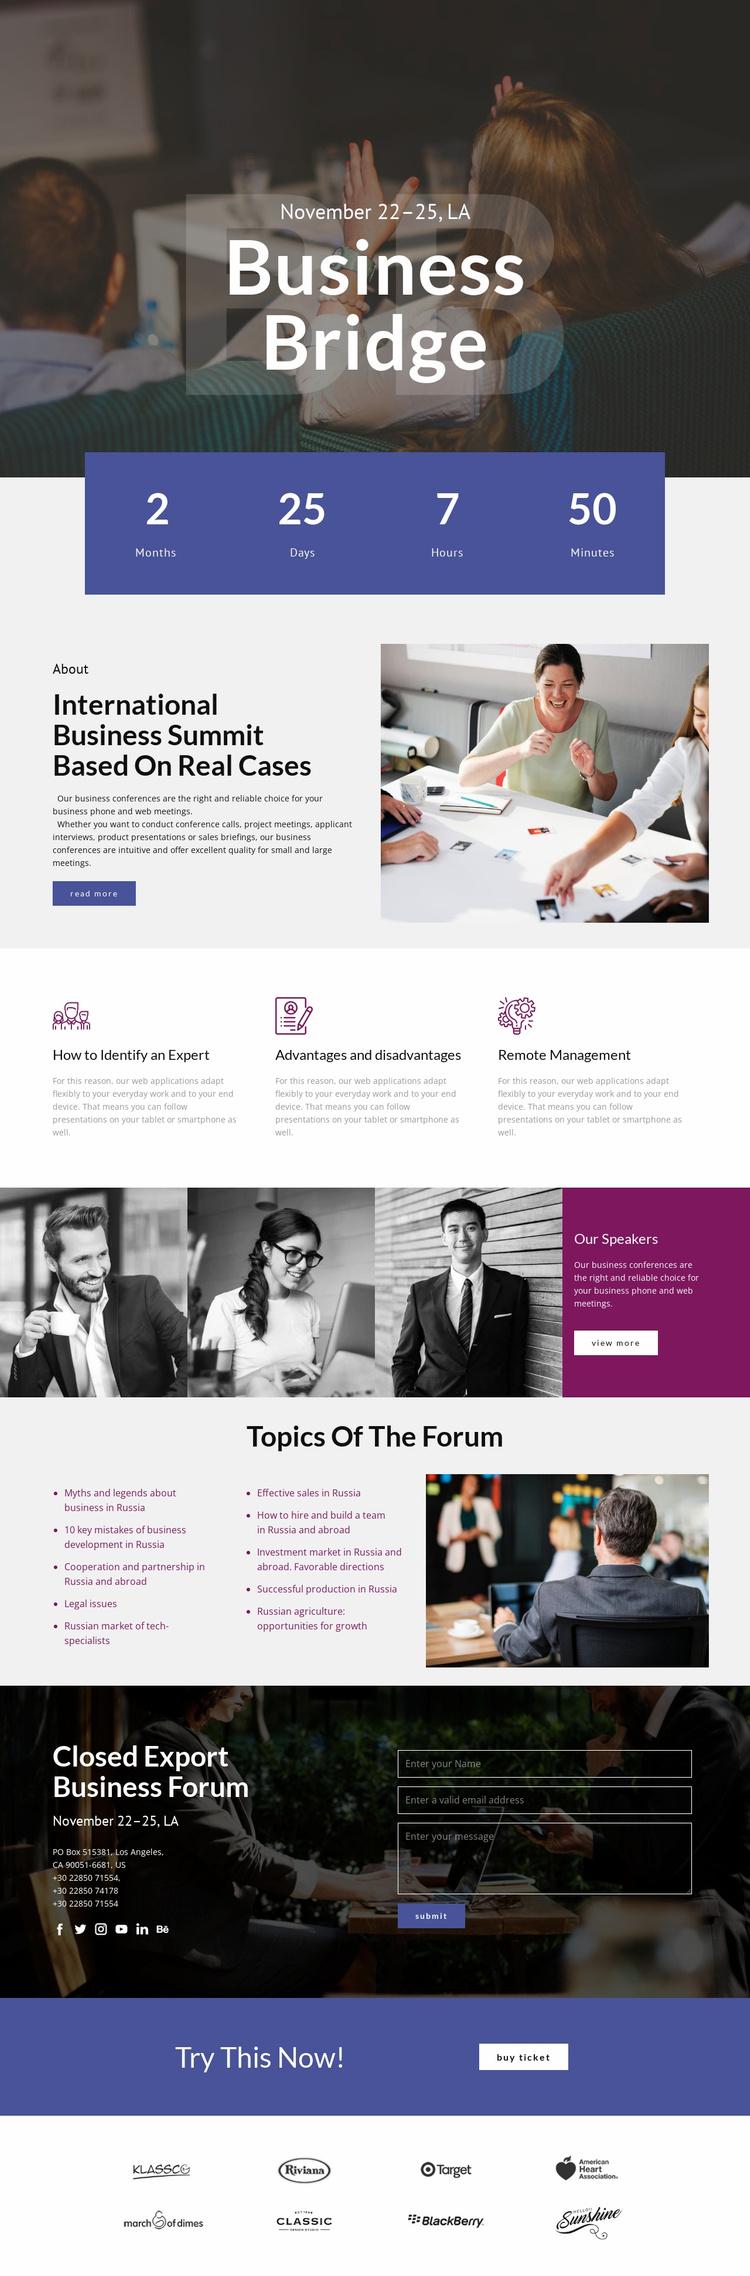 Business Bridge Website Template